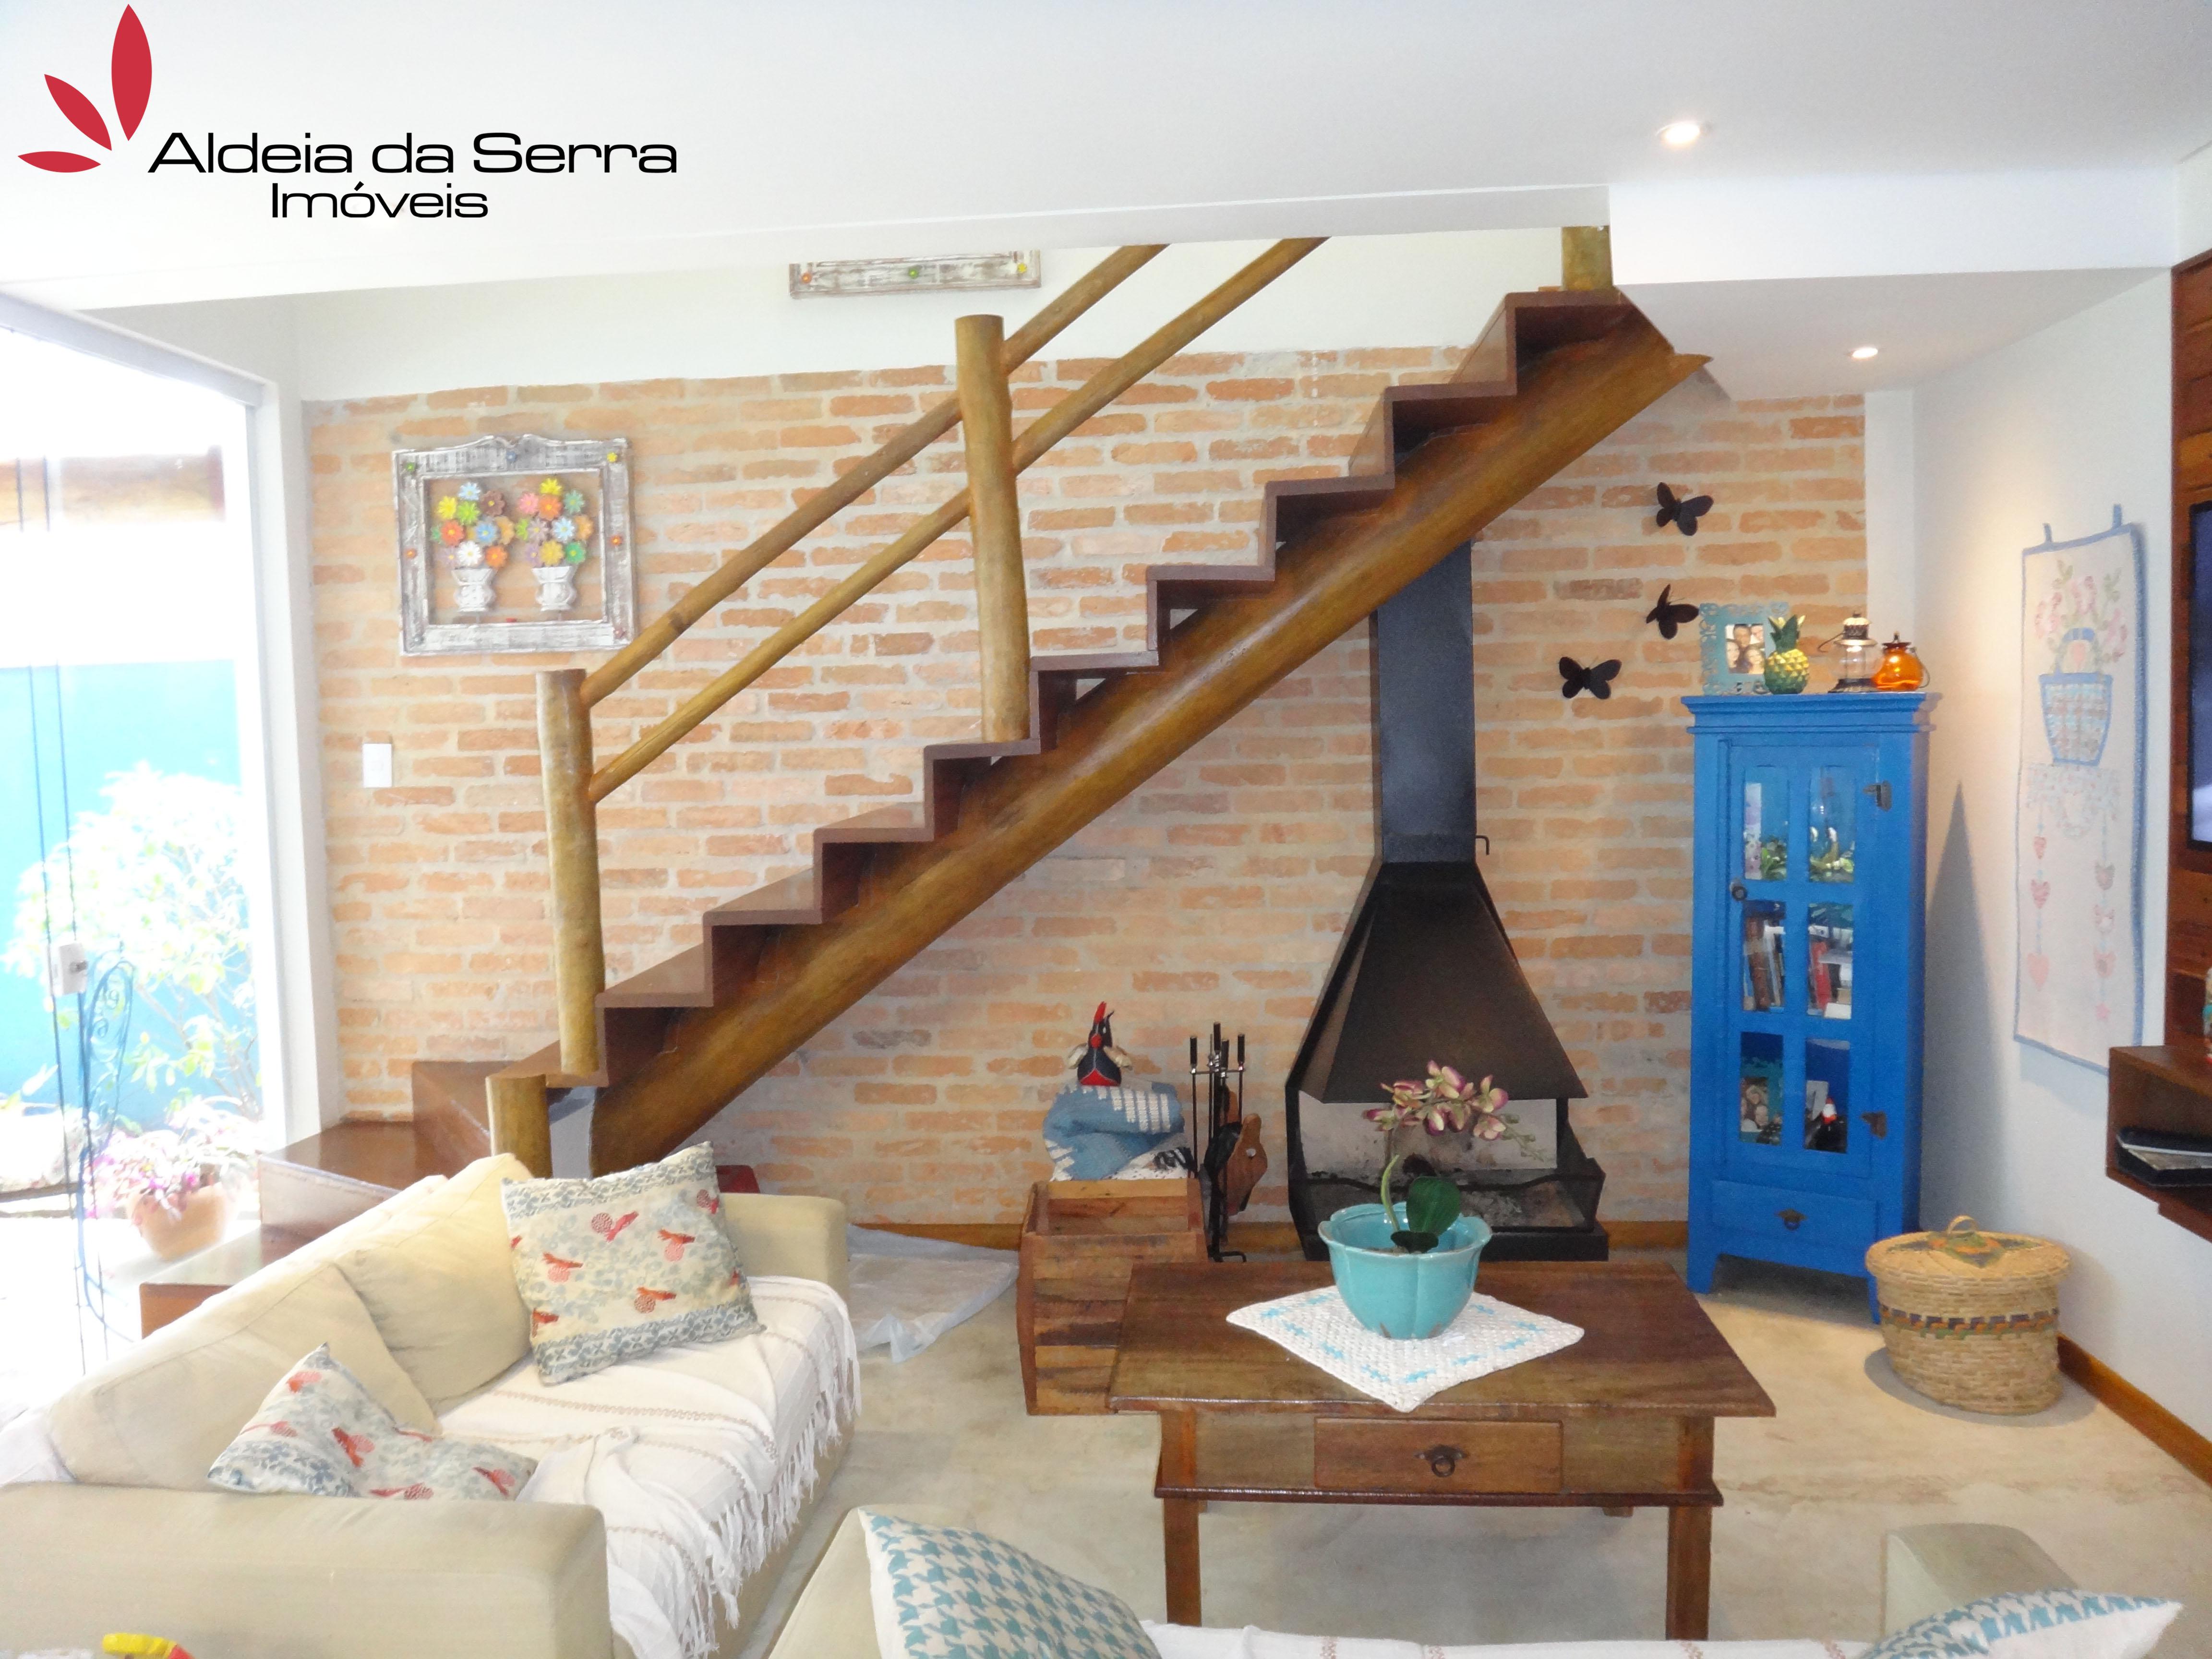 /admin/imoveis/fotos/DSC05407.JPG Aldeia da Serra Imoveis